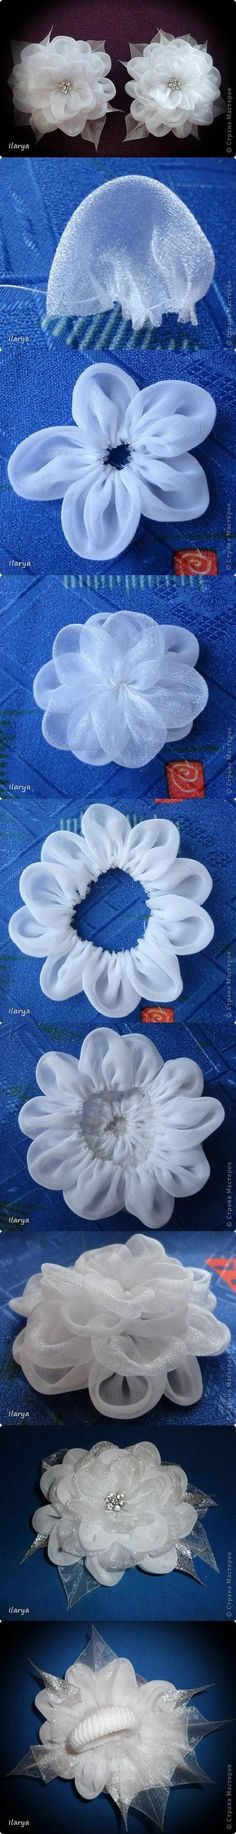 flor de organza cristal para xuxinha de cabelo